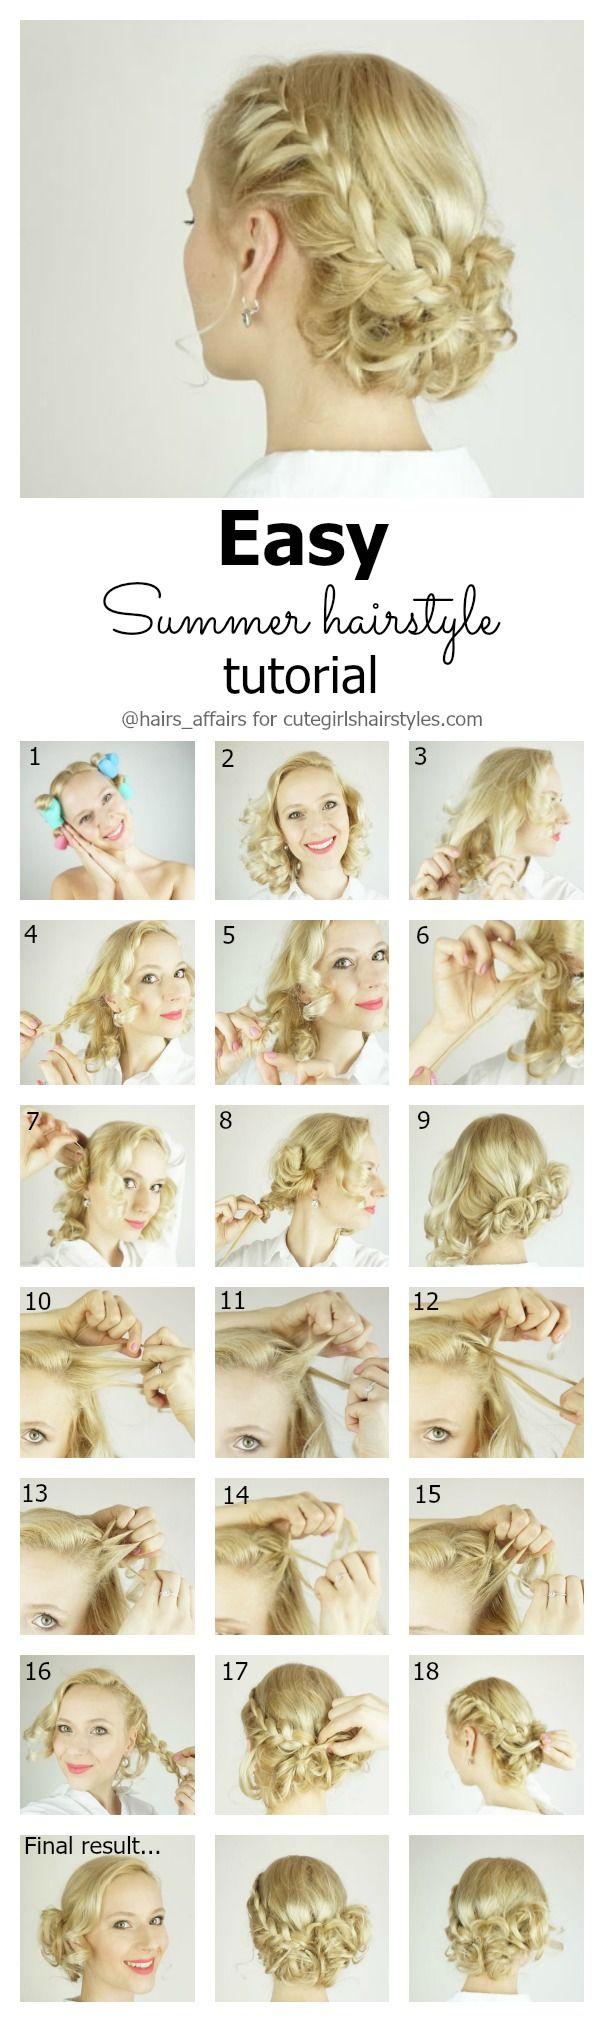 Easy summer hairstyle tutorial